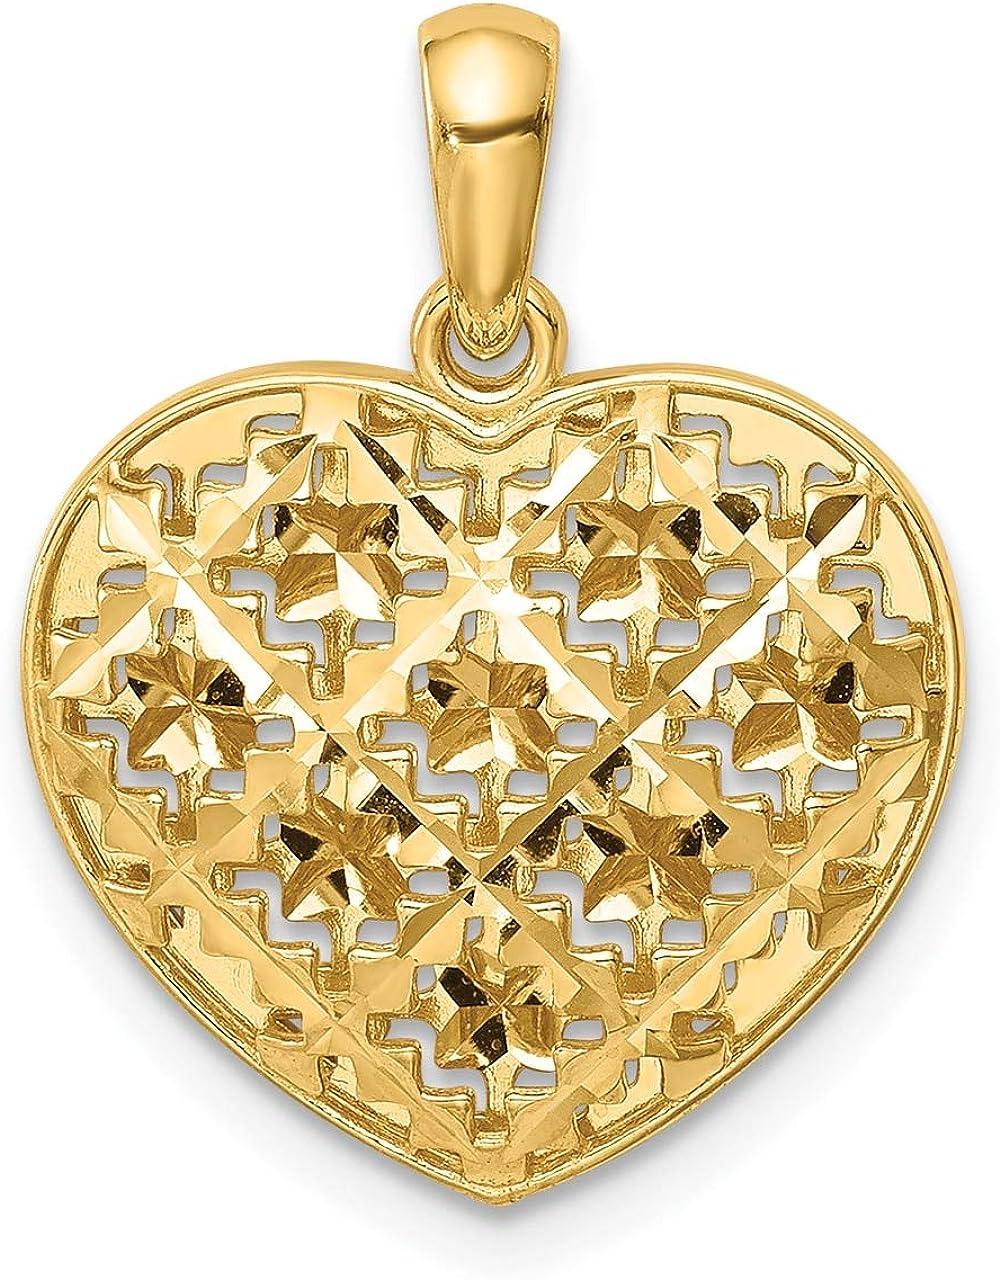 Lex /& Lu 14k Yellow Gold Polished 3D Patterned Heart Pendant